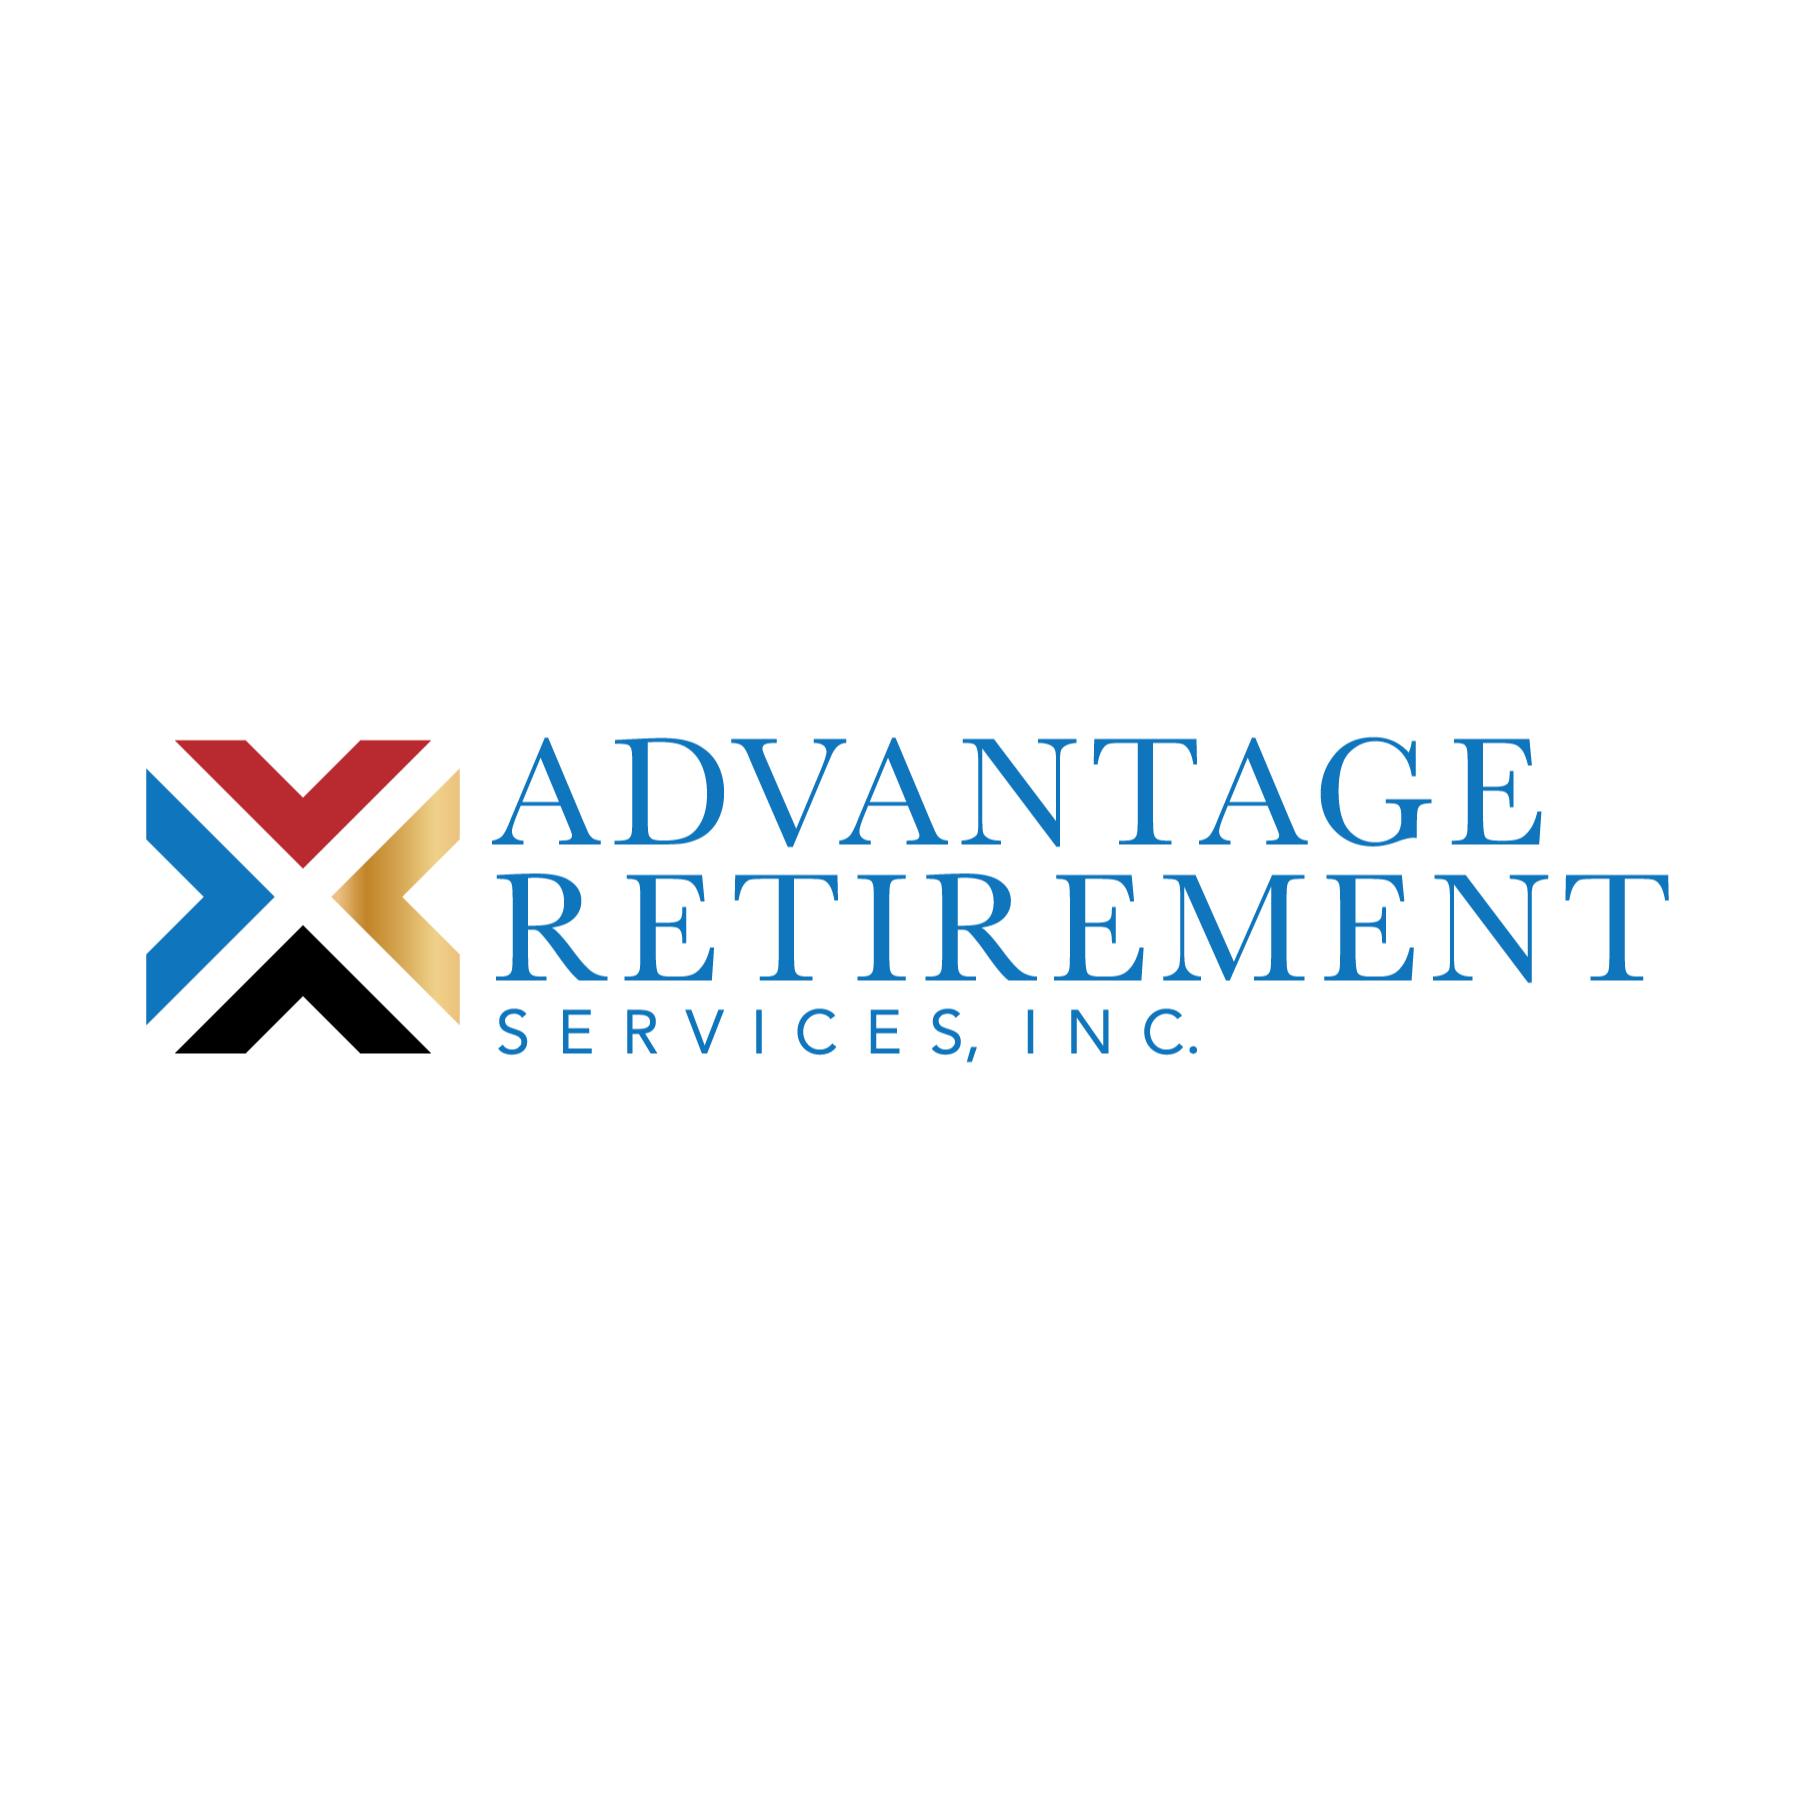 Advantage Retirement Services | Financial Advisor in Springfield,Missouri